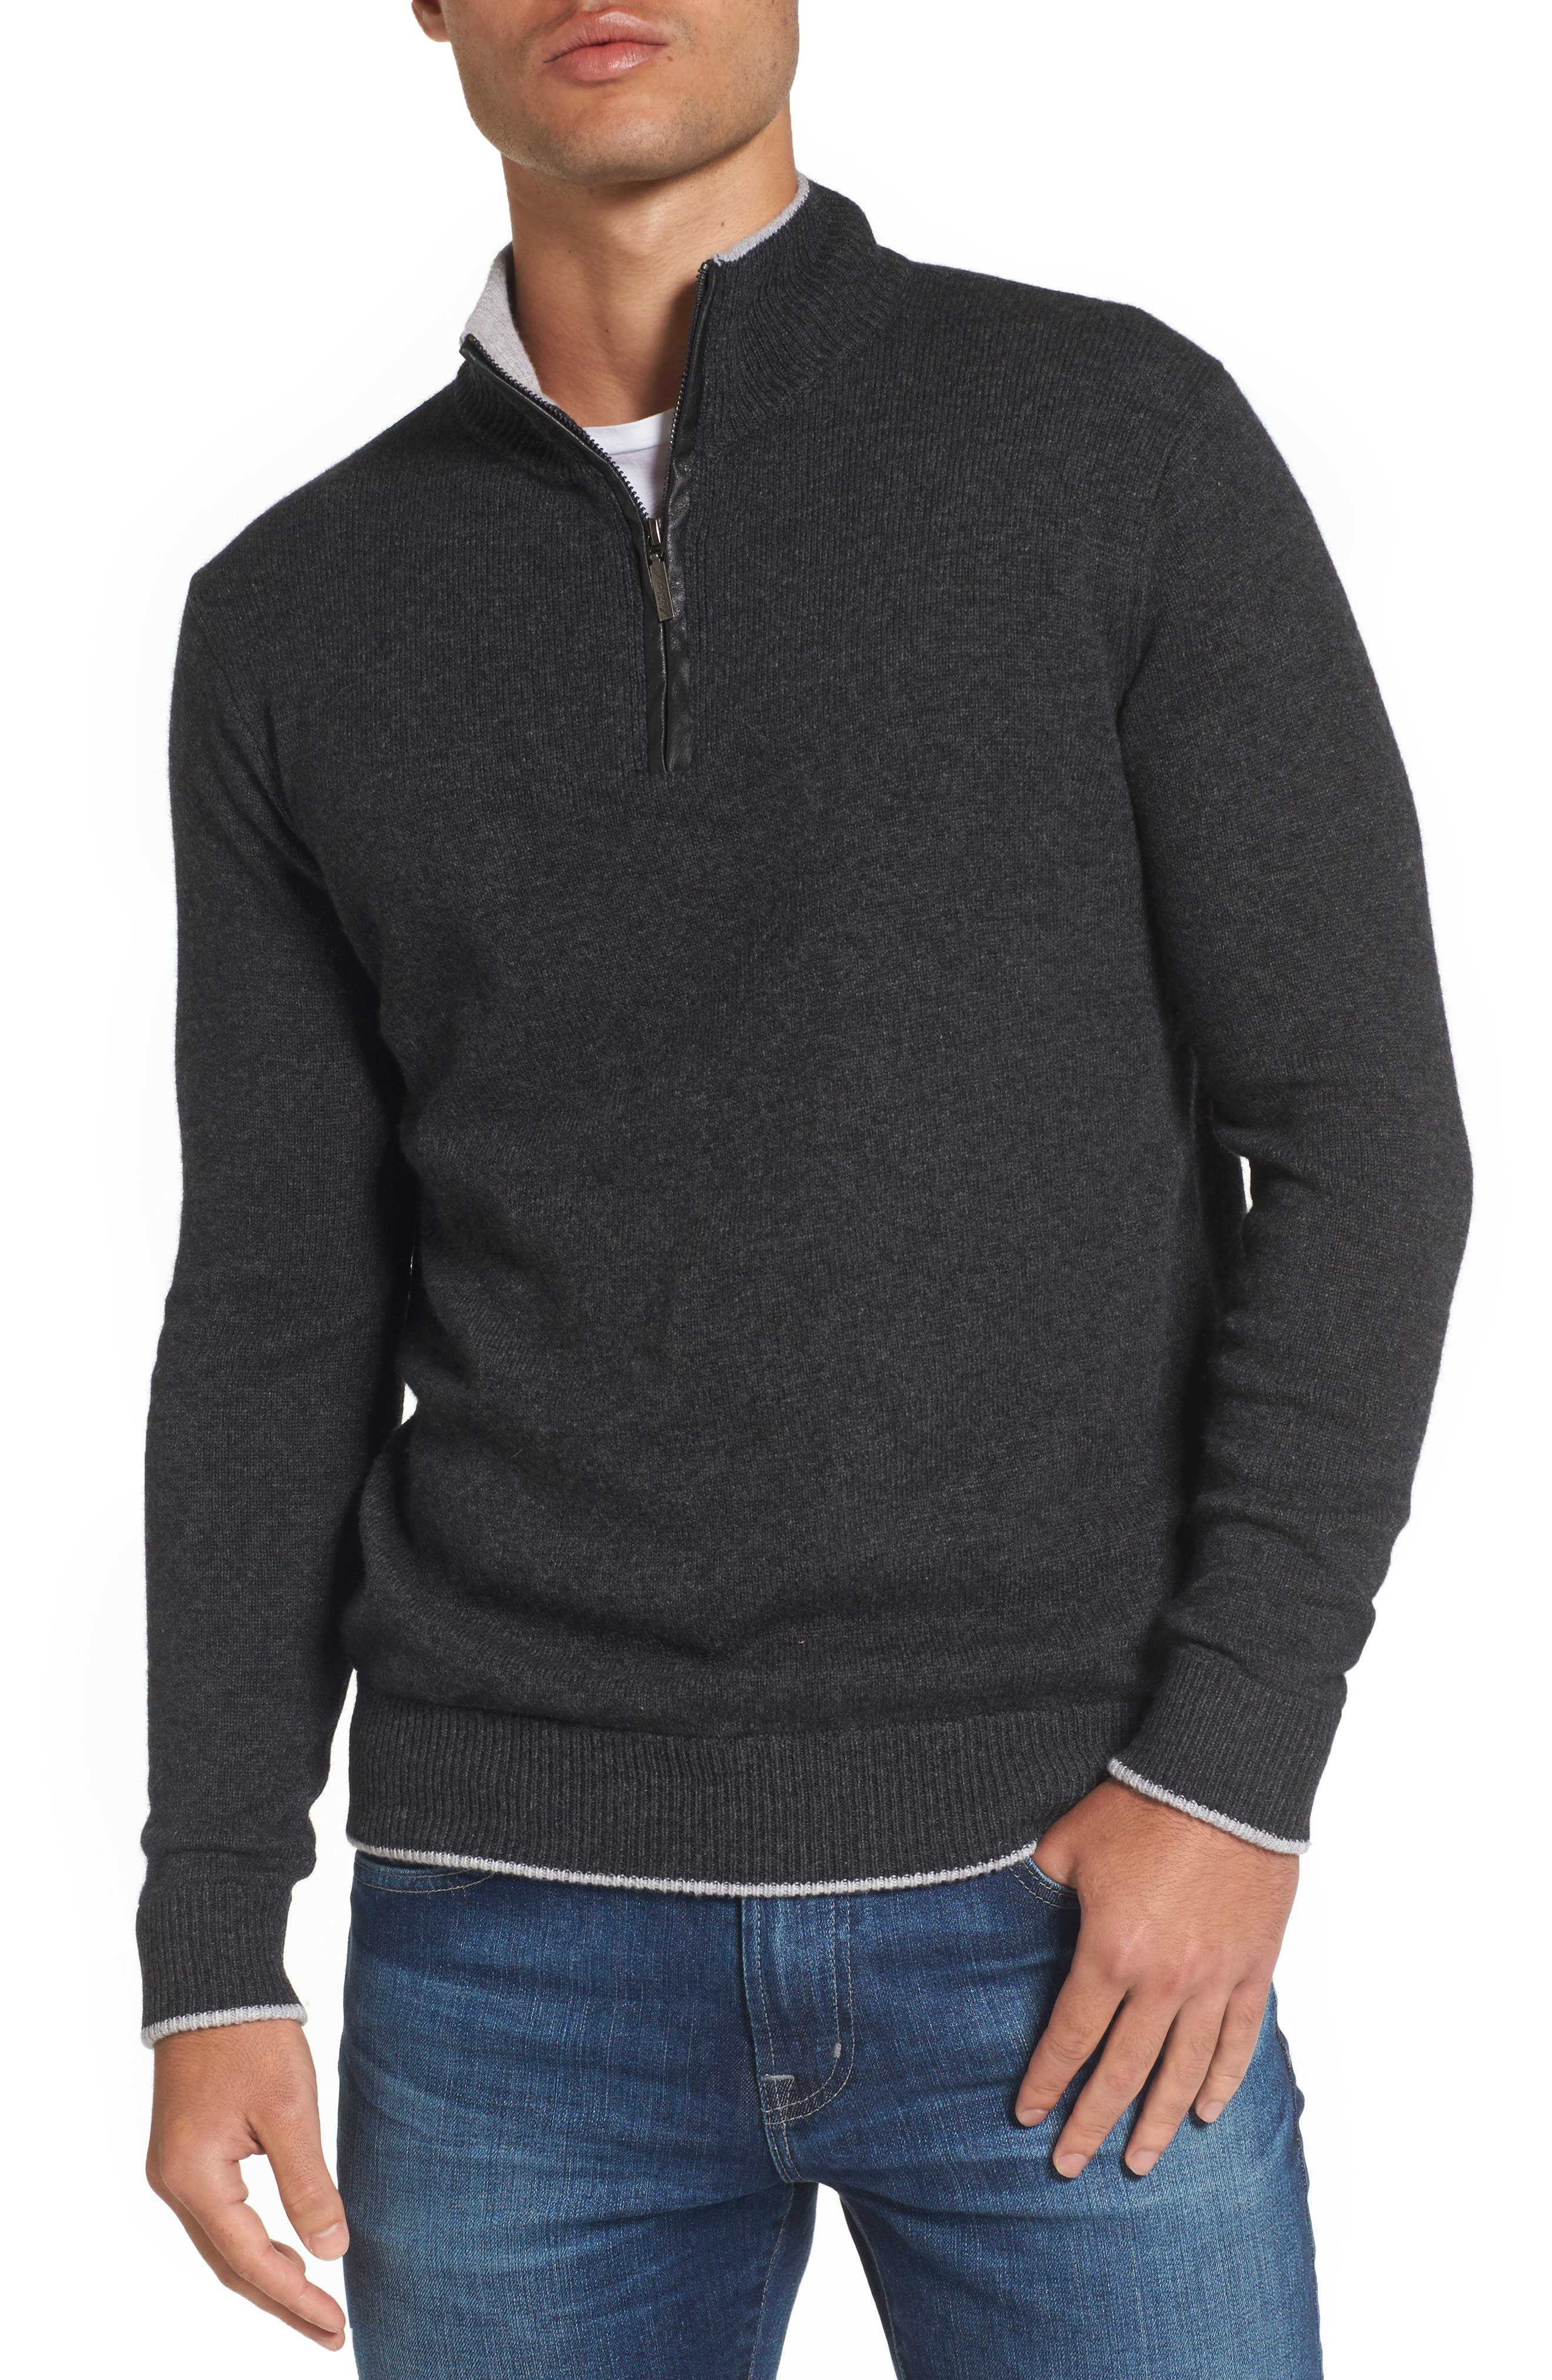 Wool Blend Quarter Zip Sweater,                             Main thumbnail 1, color,                             Dark Grey